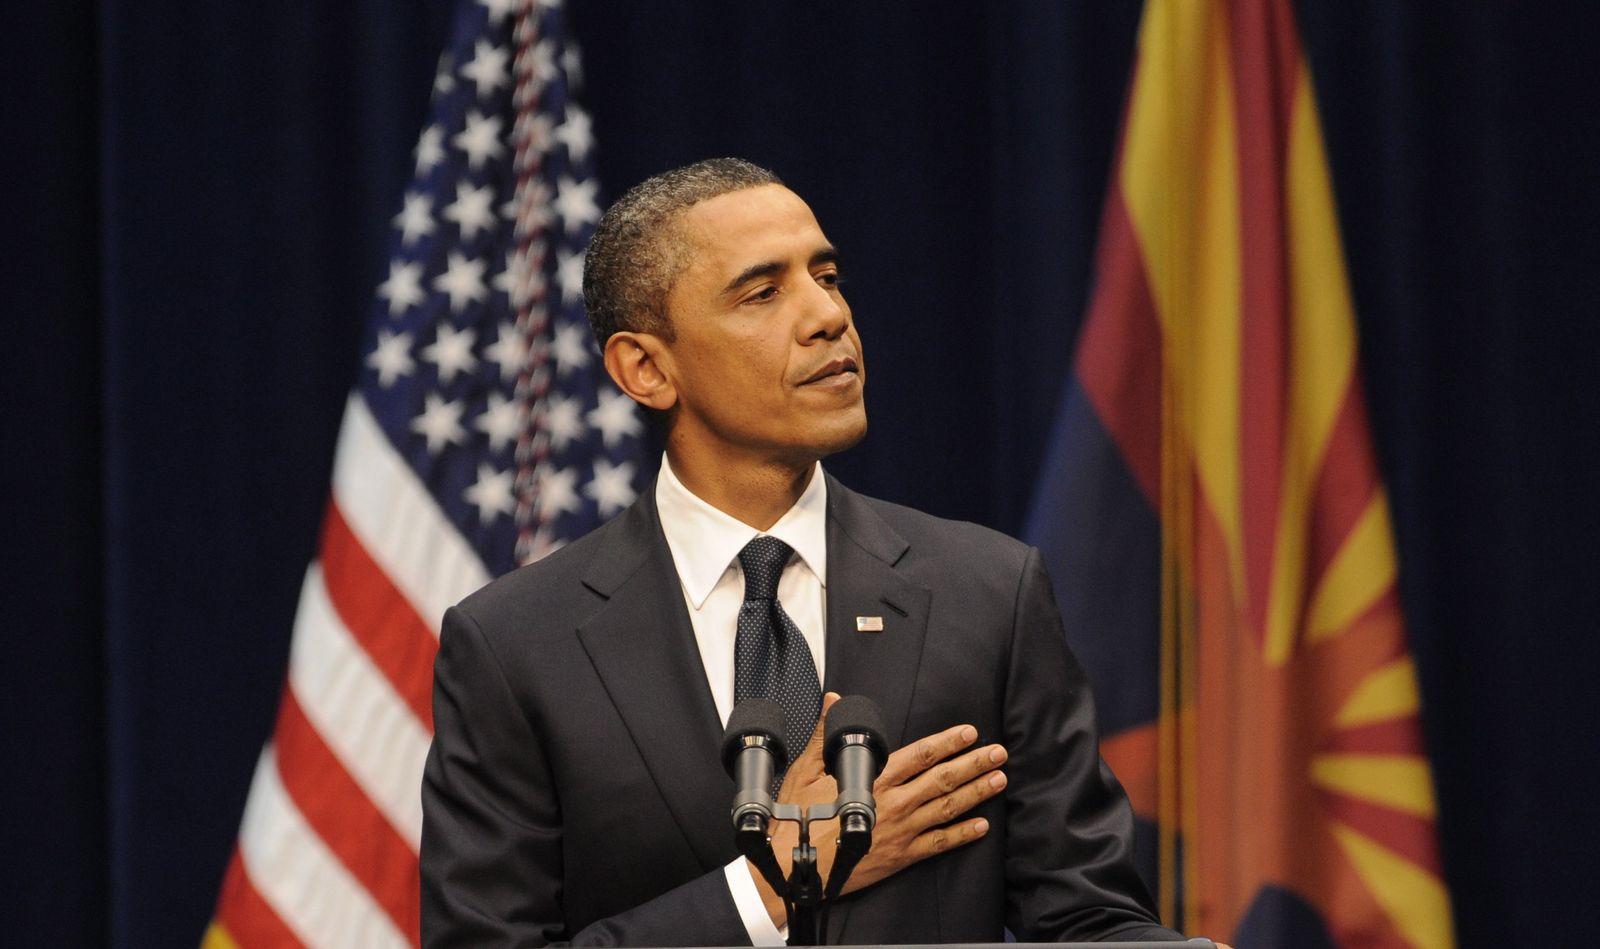 Obama/ Tucson